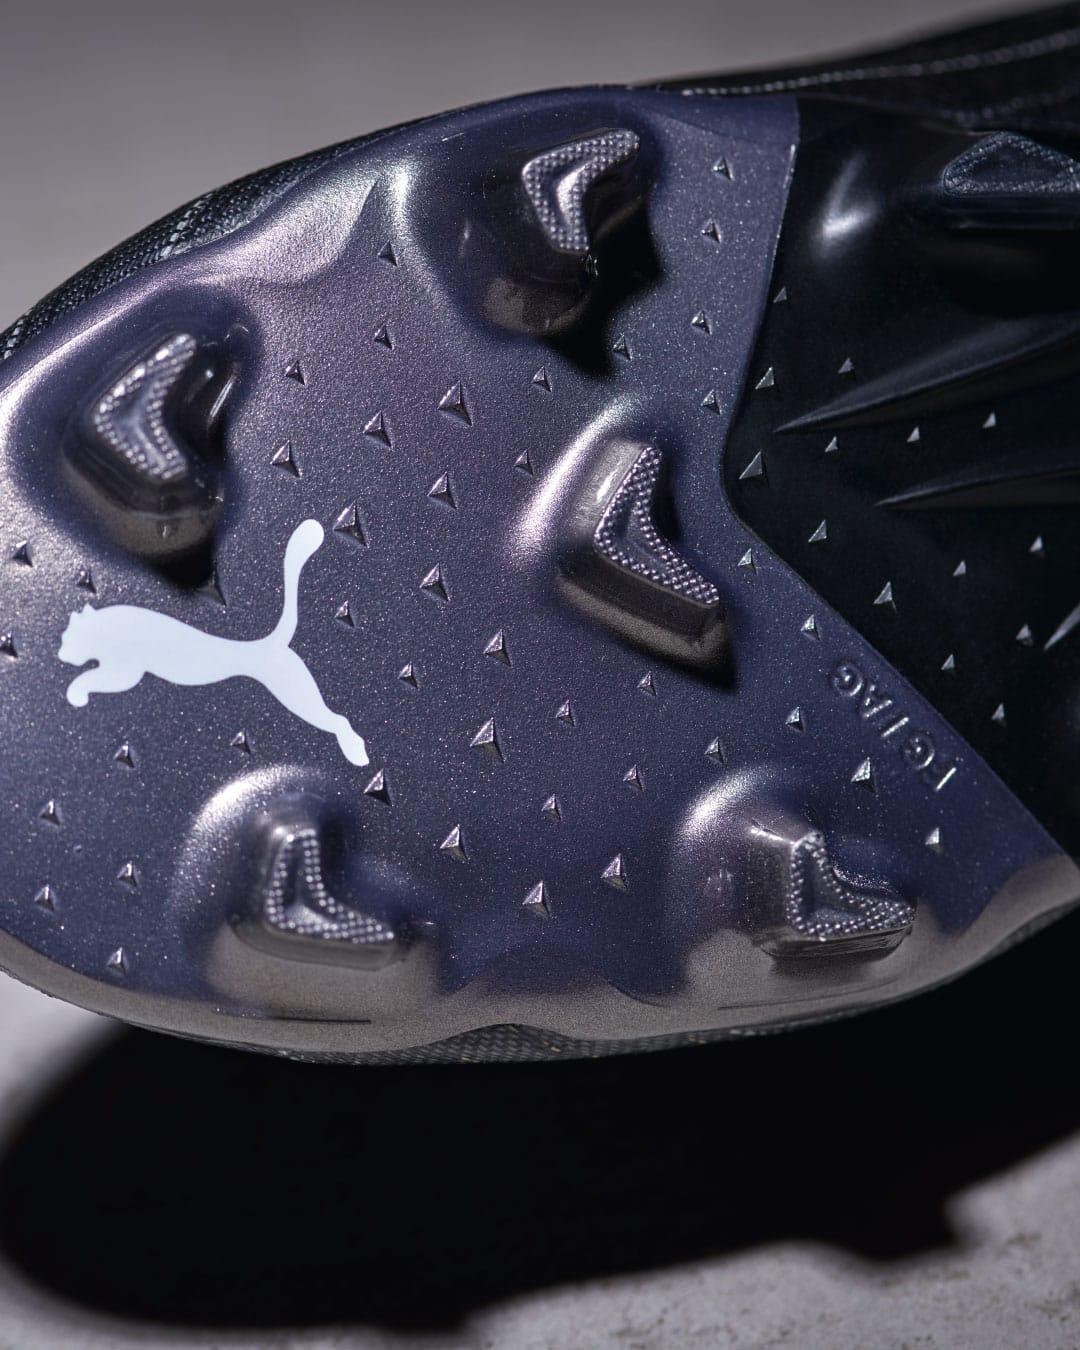 chaussures-football-puma-ultra-puma-future-z-eclipse-pack-2021-footpack-15